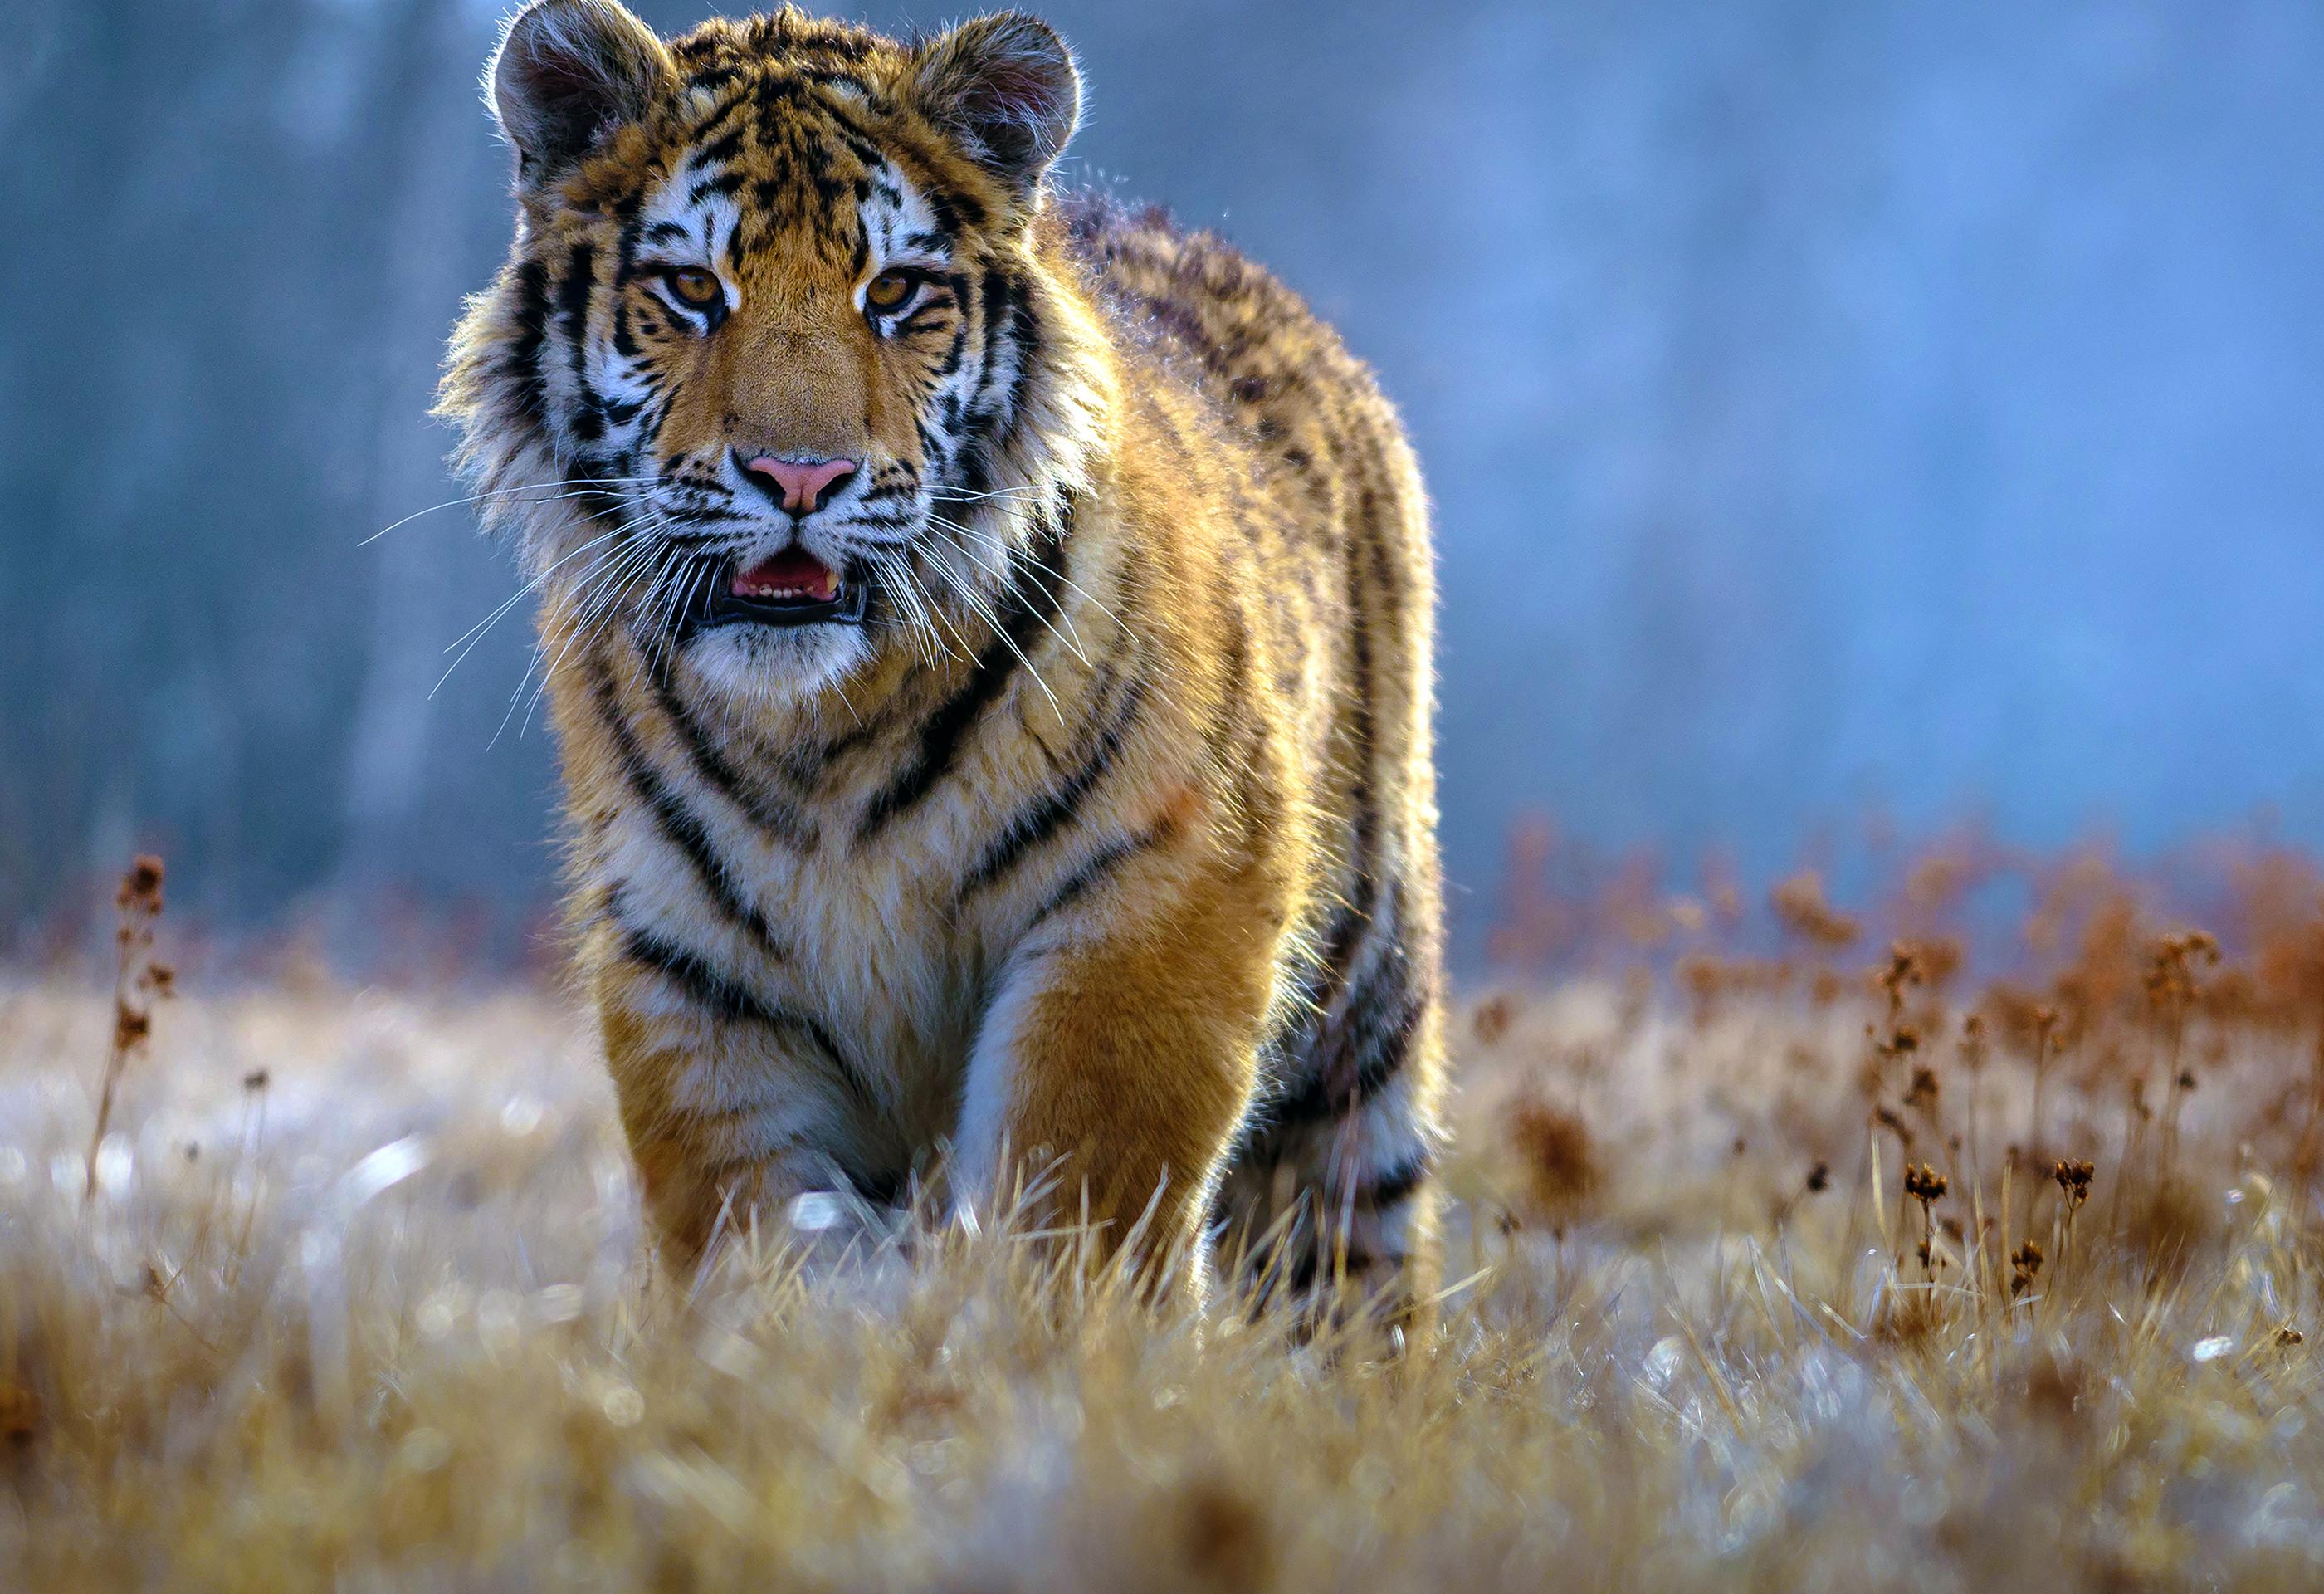 Tigre en un campo (Shutterstock)